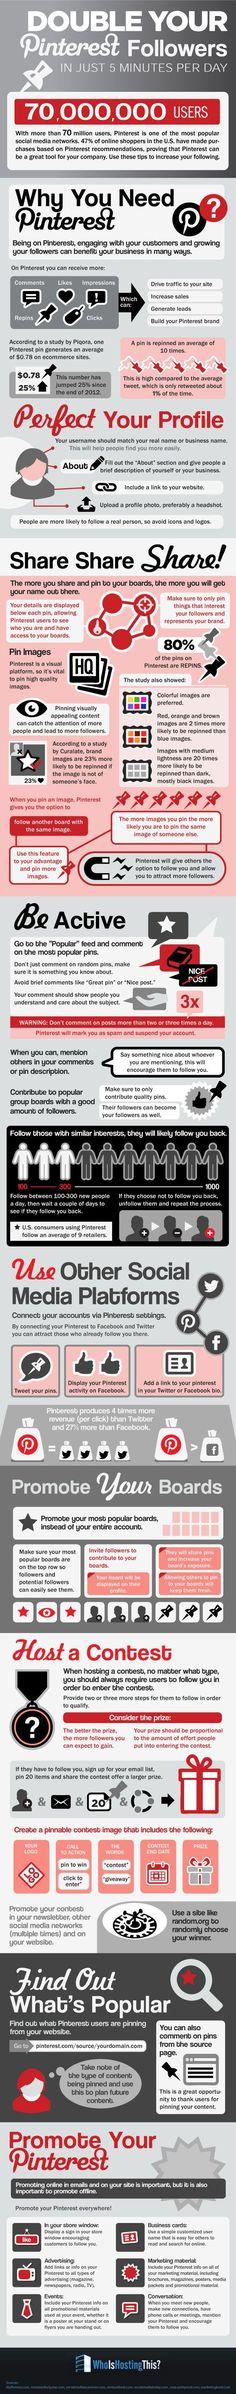 Cómo doblar tus seguidores en Pinterest en 5 minutos diarios (infografías de #Marketing via @socialetic)